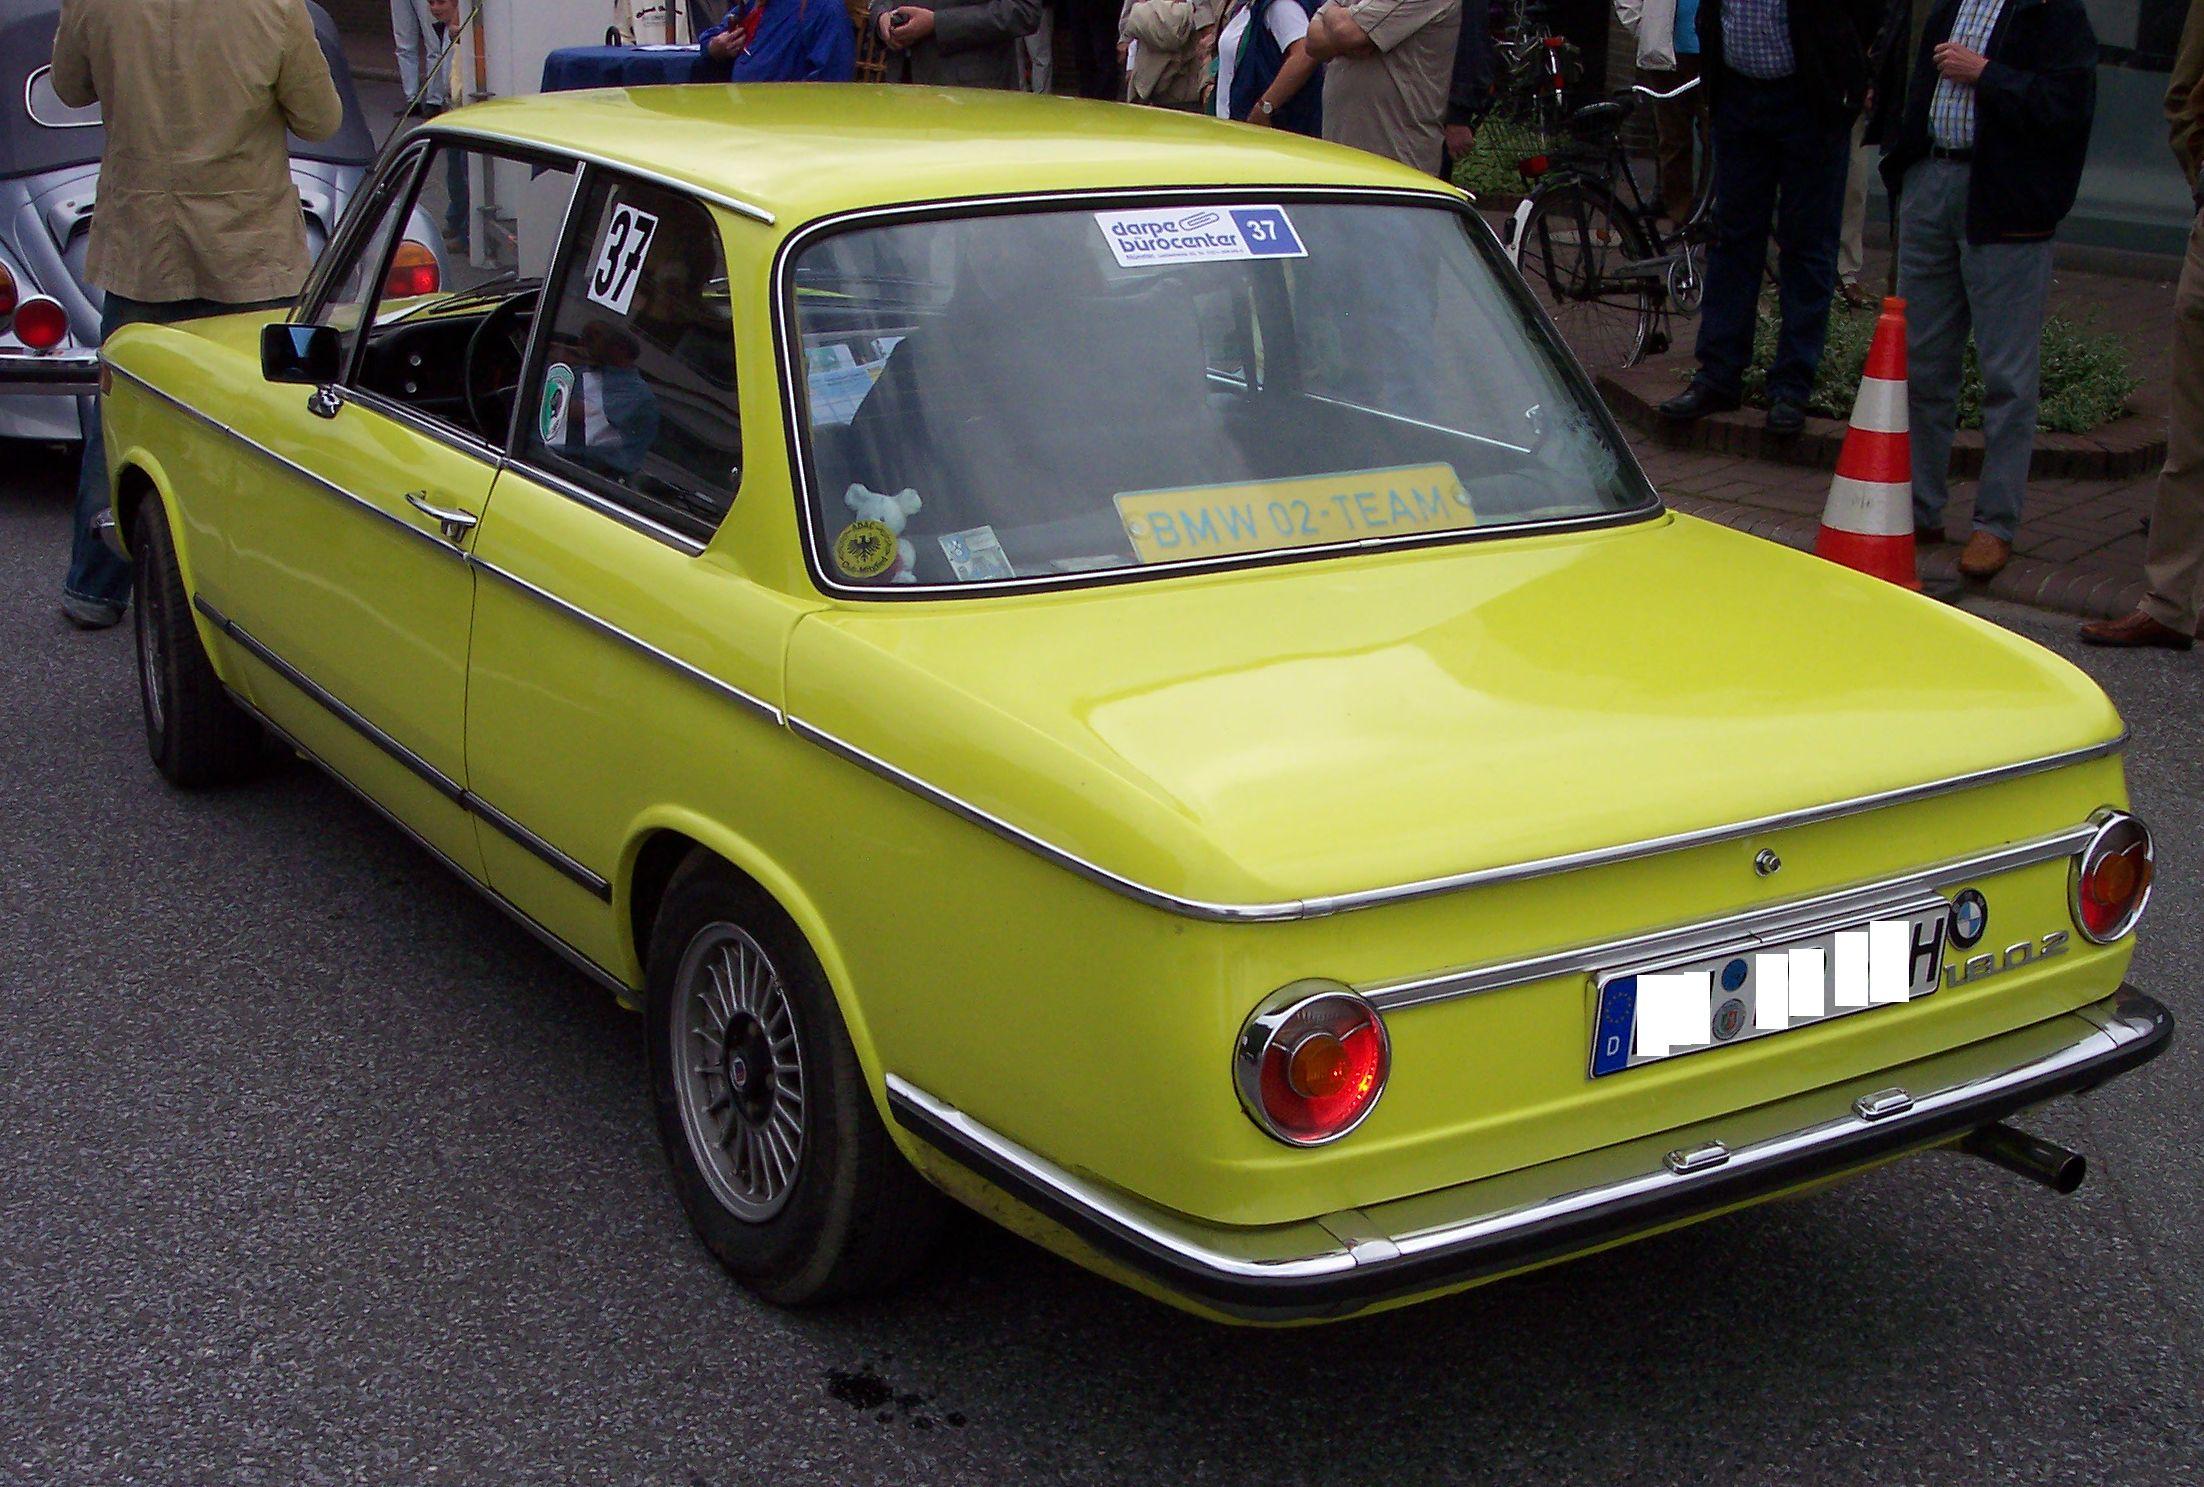 File:BMW 1802 yellow hl.jpg - Wikimedia Commons